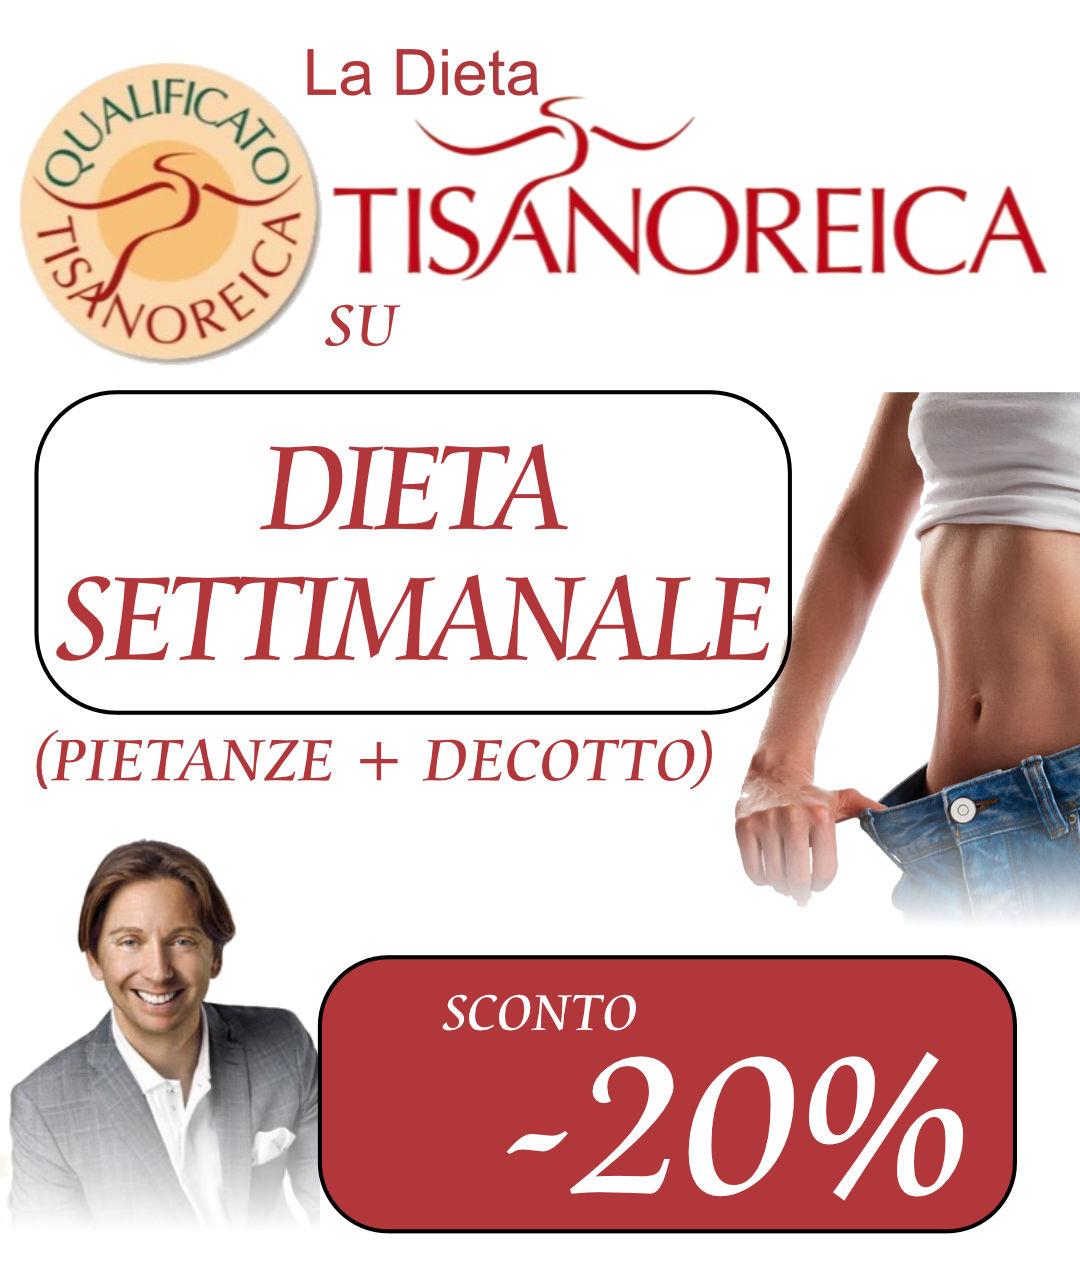 TISANOREICA-settimanale-20x100